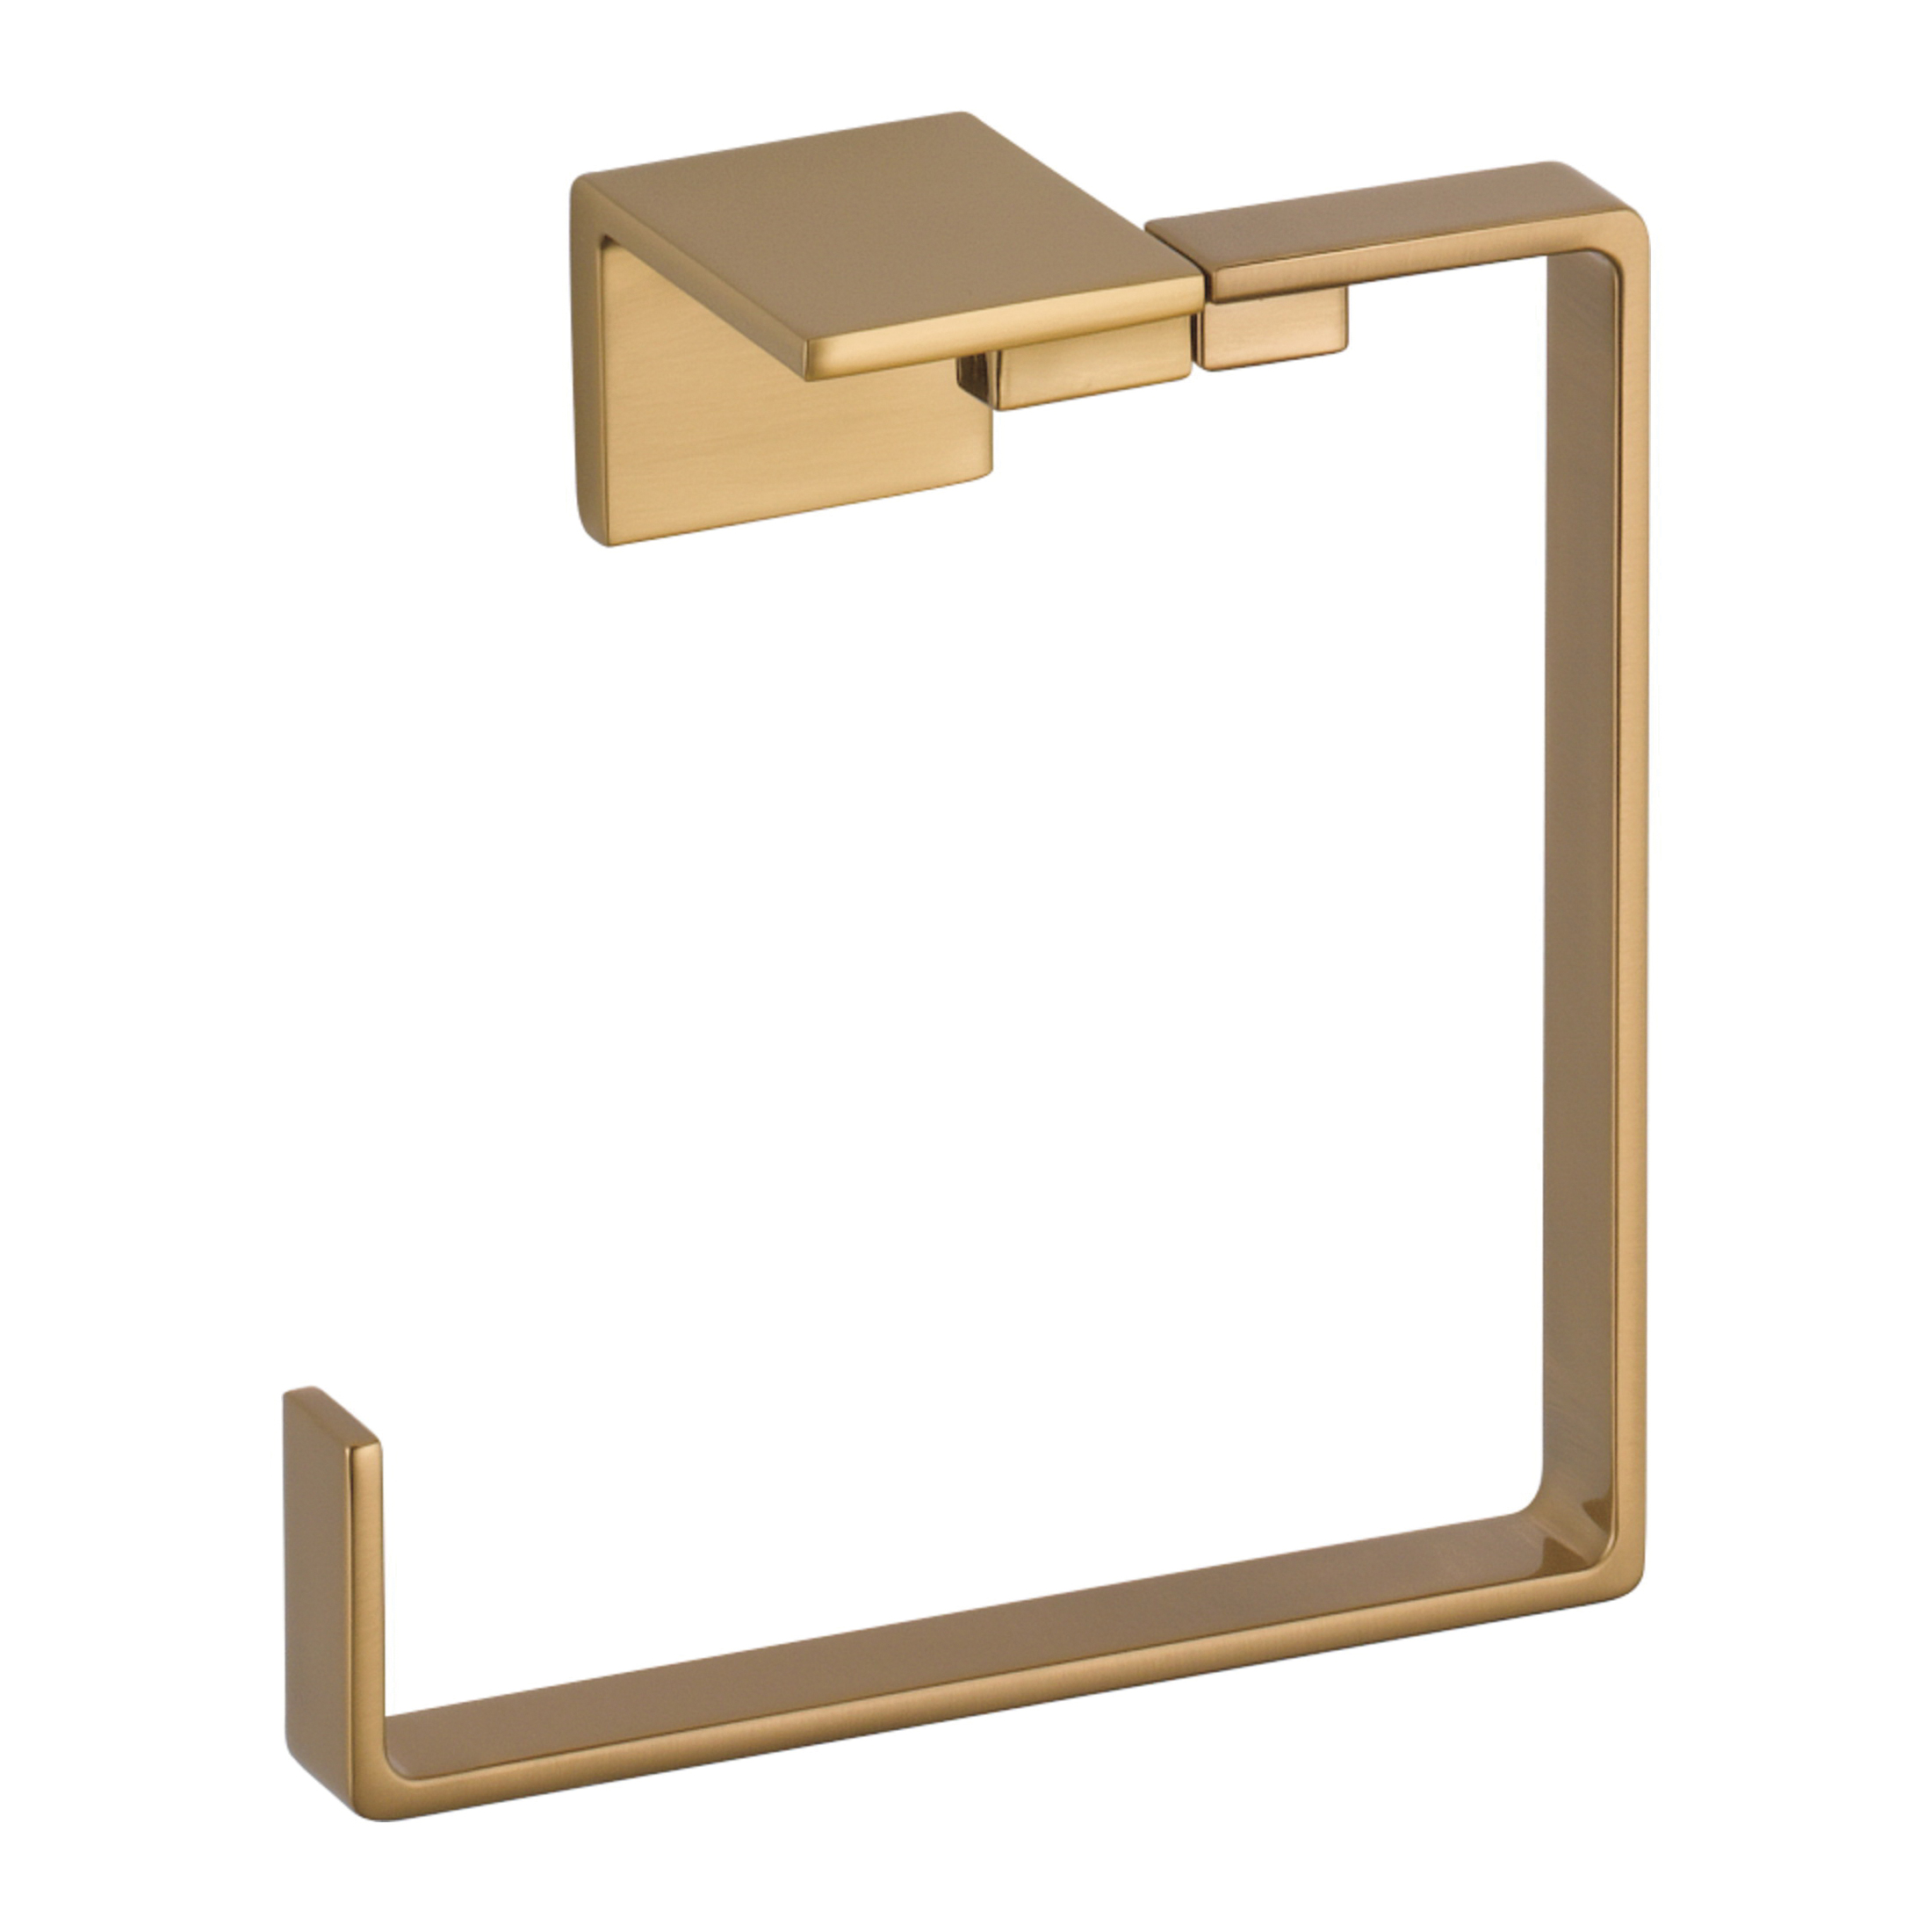 DELTA® 77746-CZ Vero® Towel Ring, 3 in OAD x 6-1/2 in OAH, Brilliance® Champagne Bronze, Import